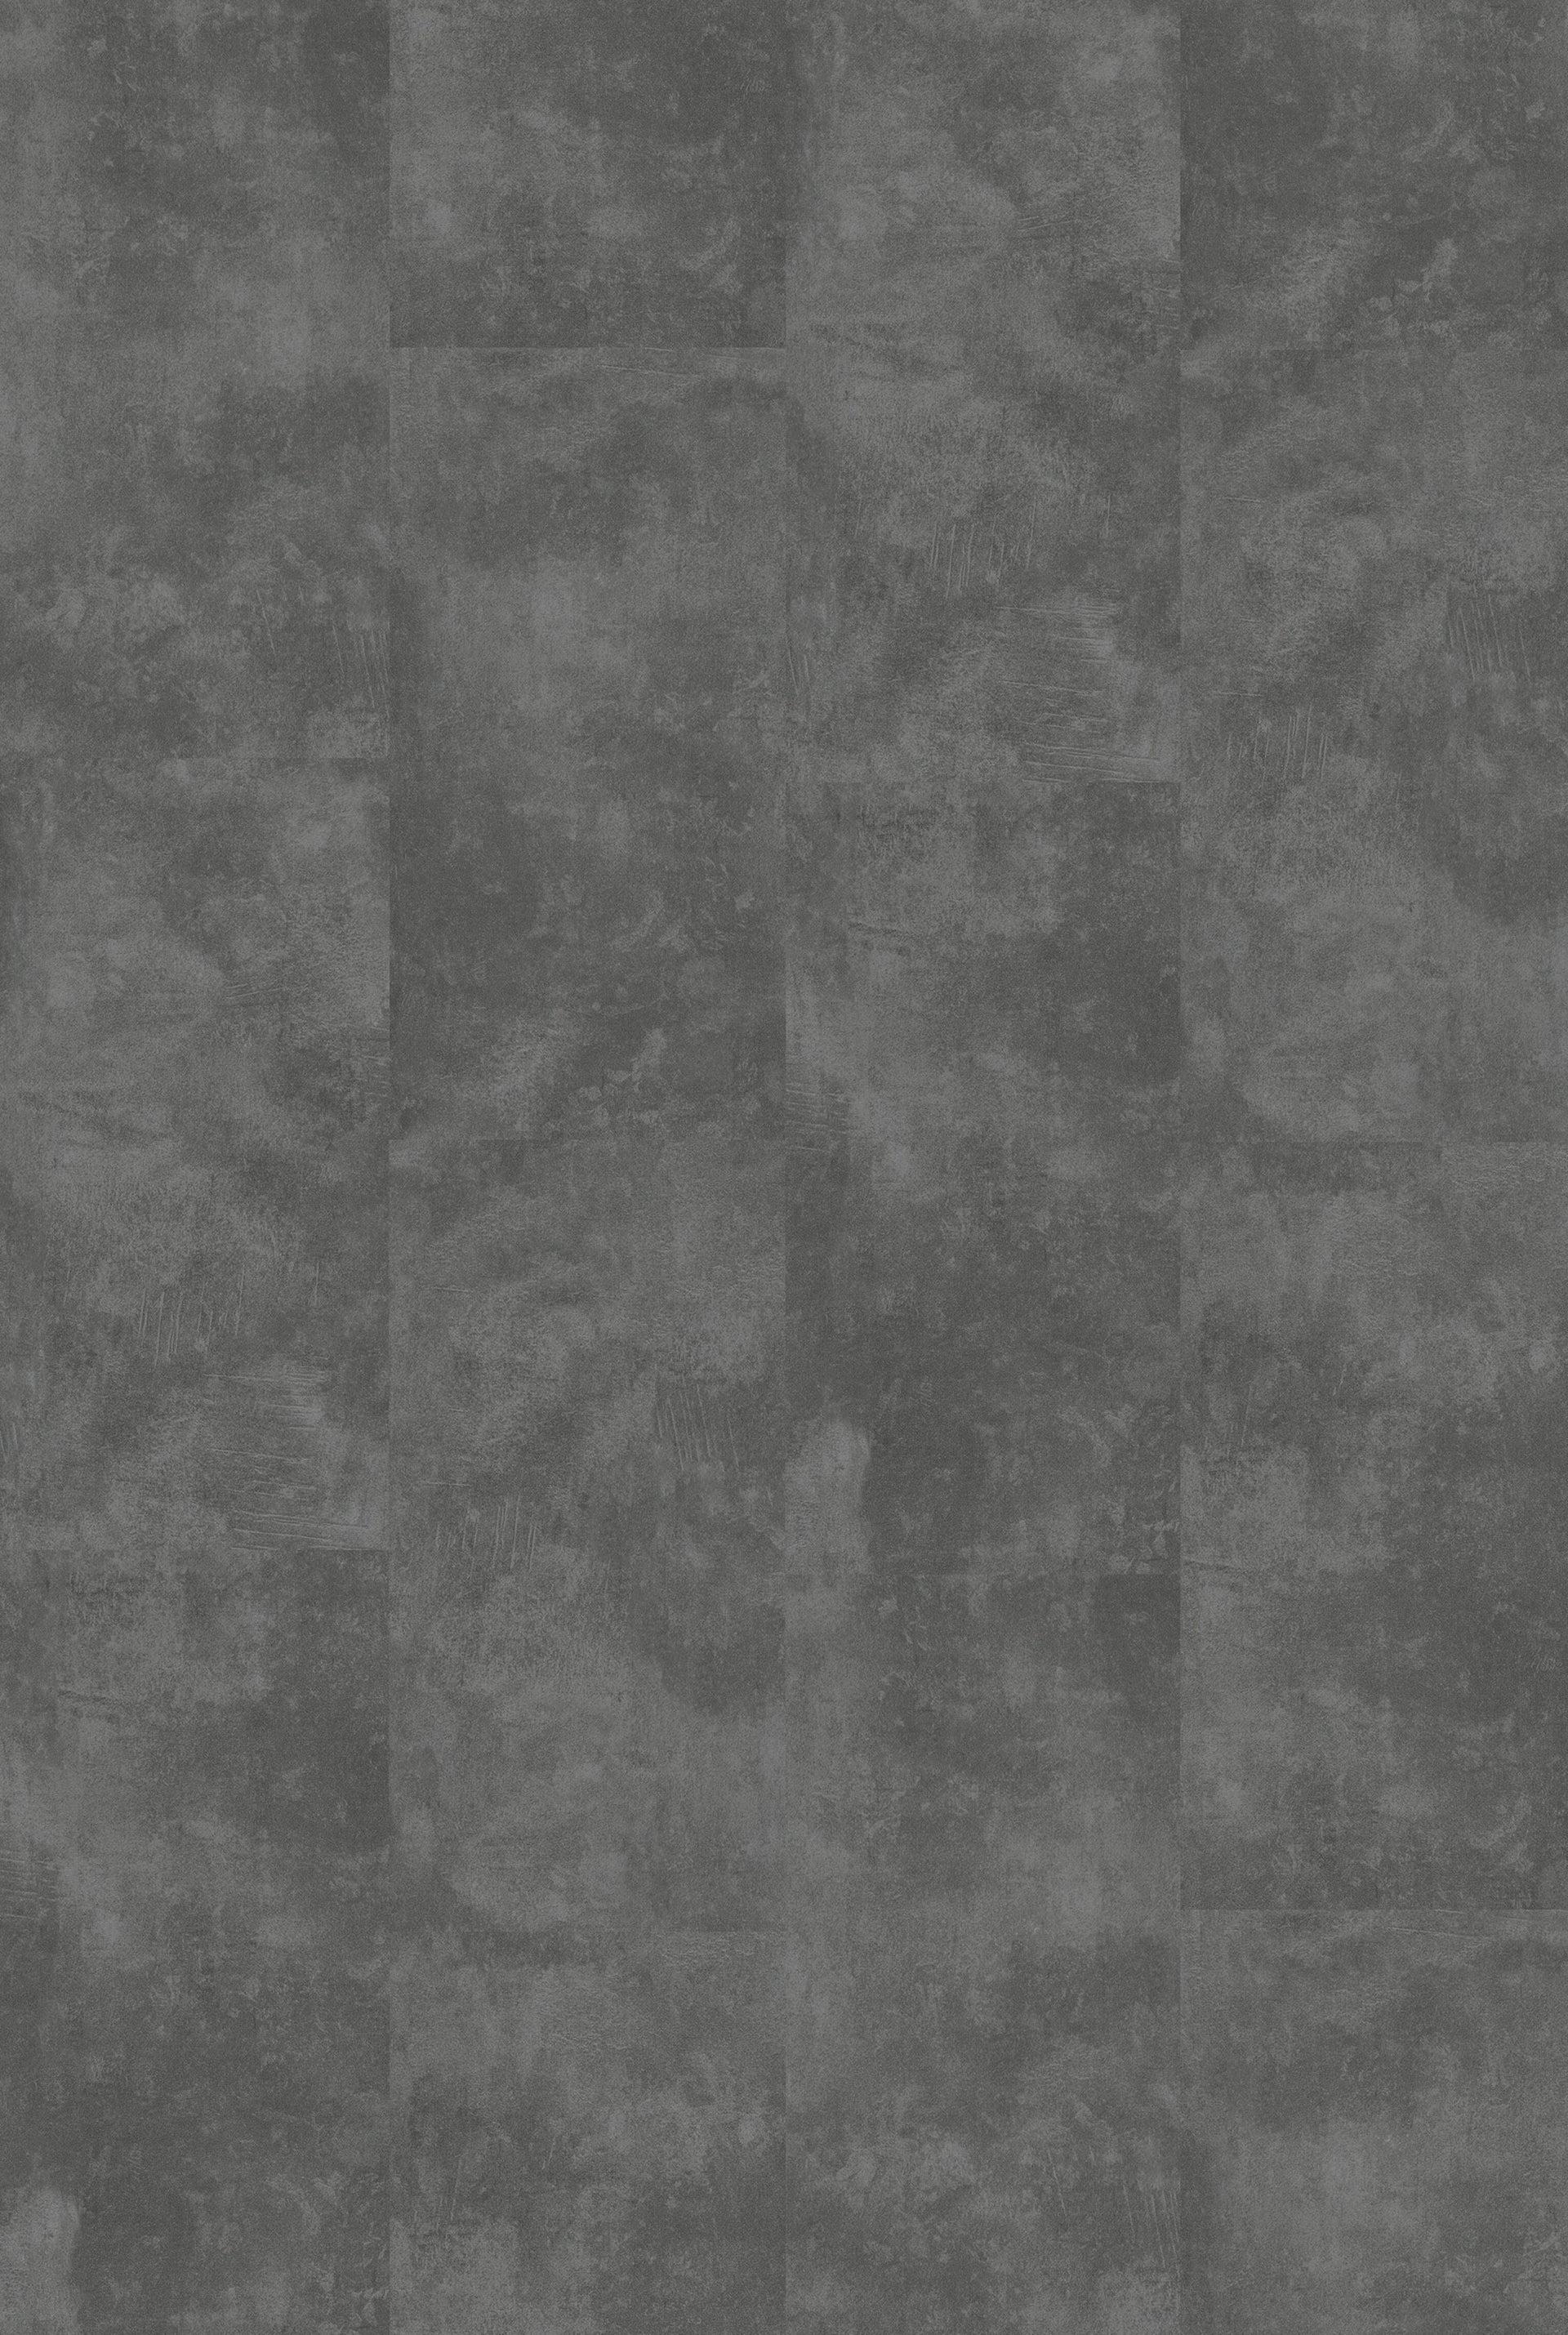 Pavimento PVC incastro Tolu Sp 4 mm grigio / argento - 6